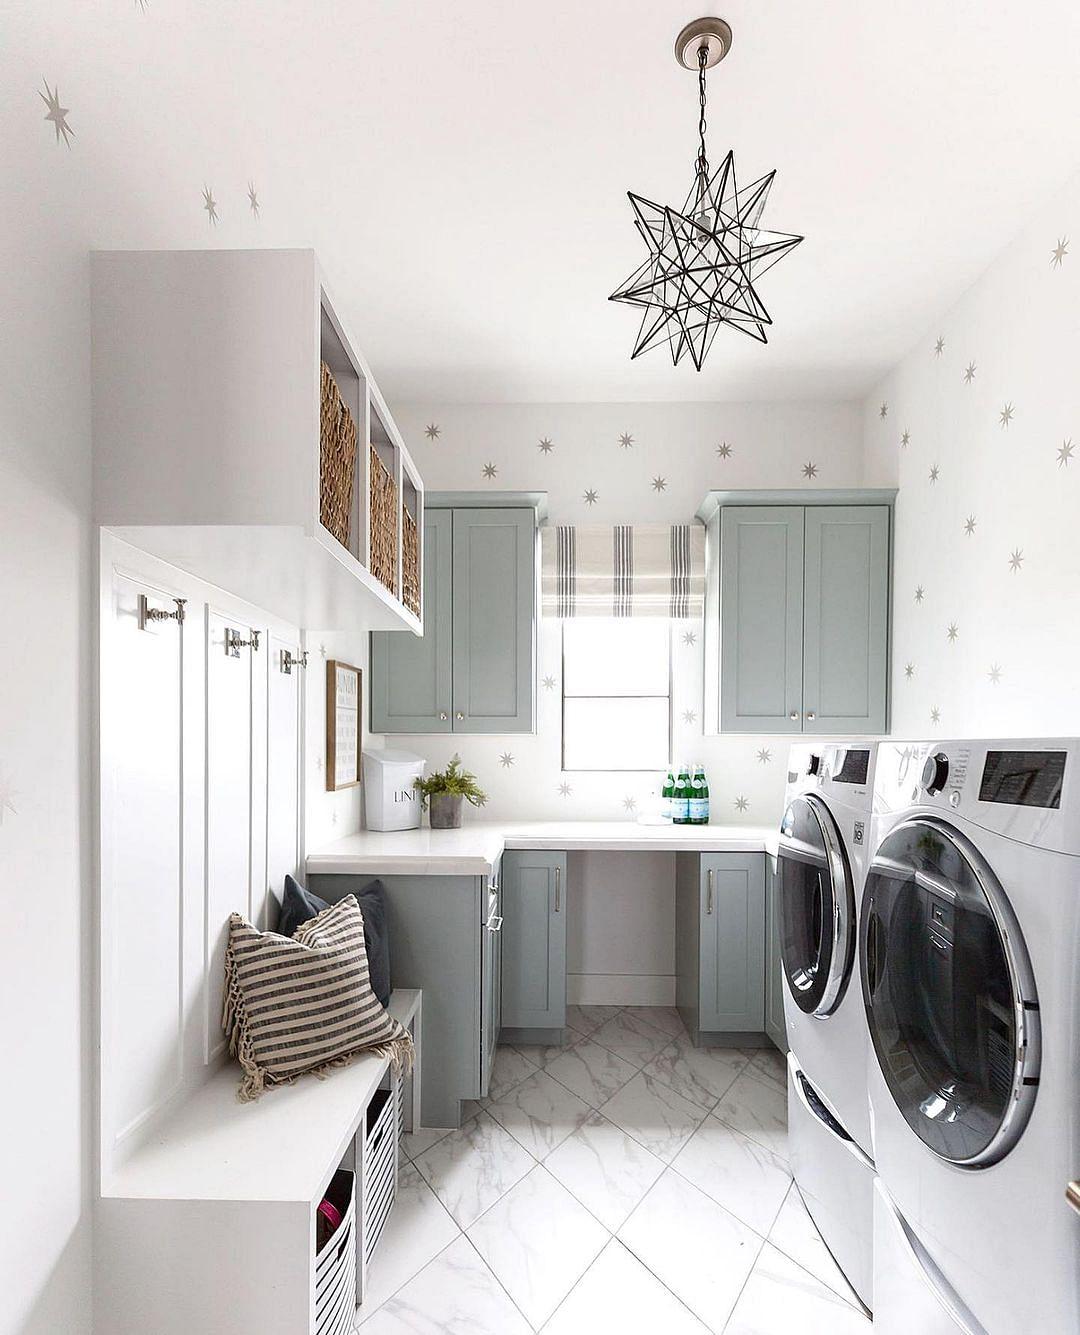 small laundry room design ideas   Houszed